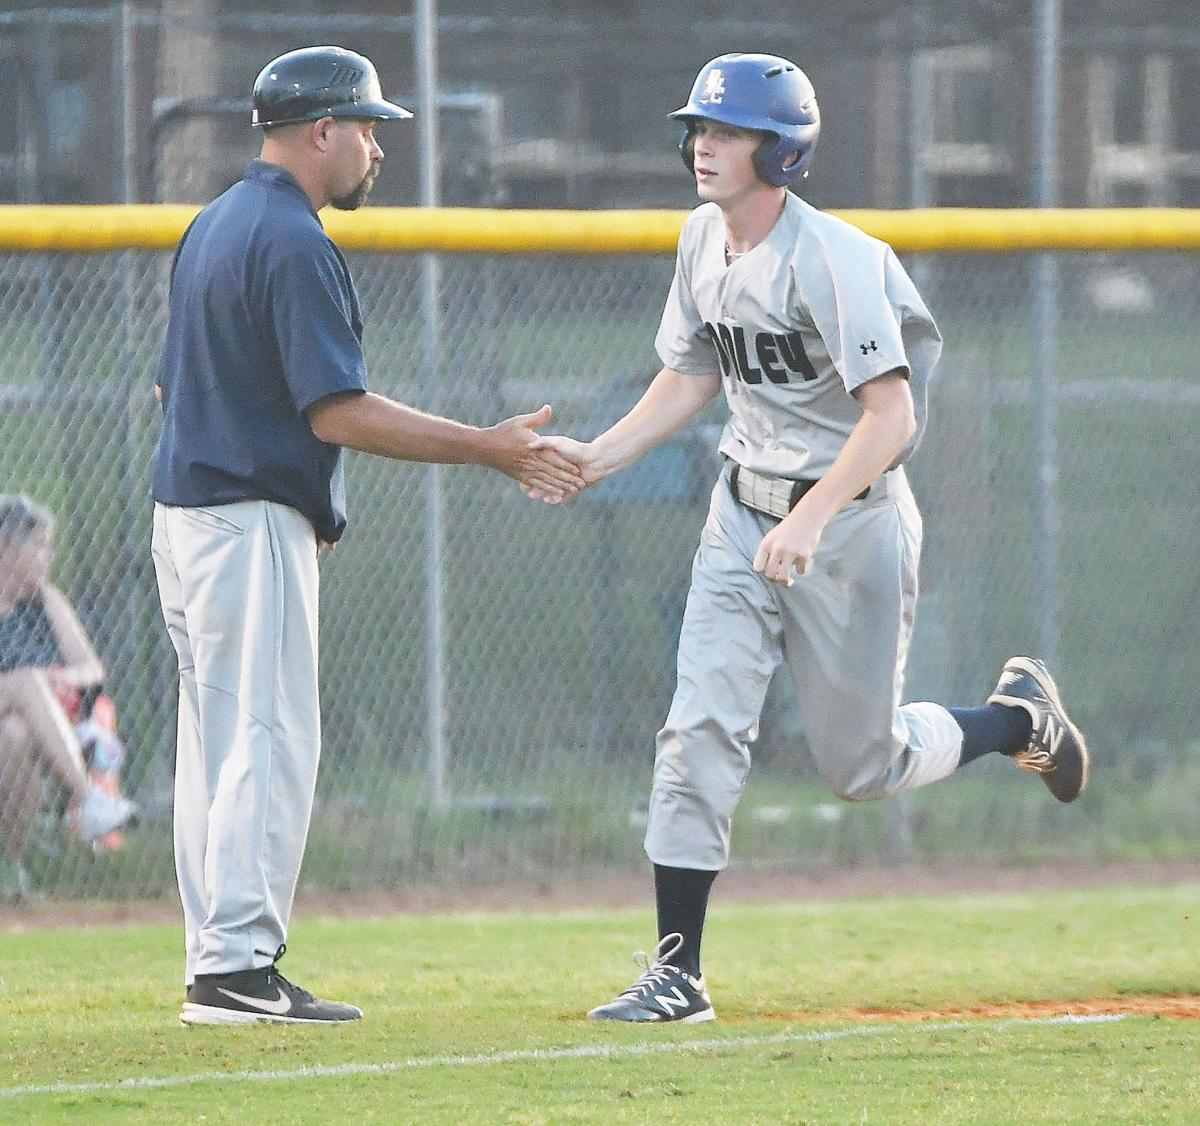 Conley baseball 1